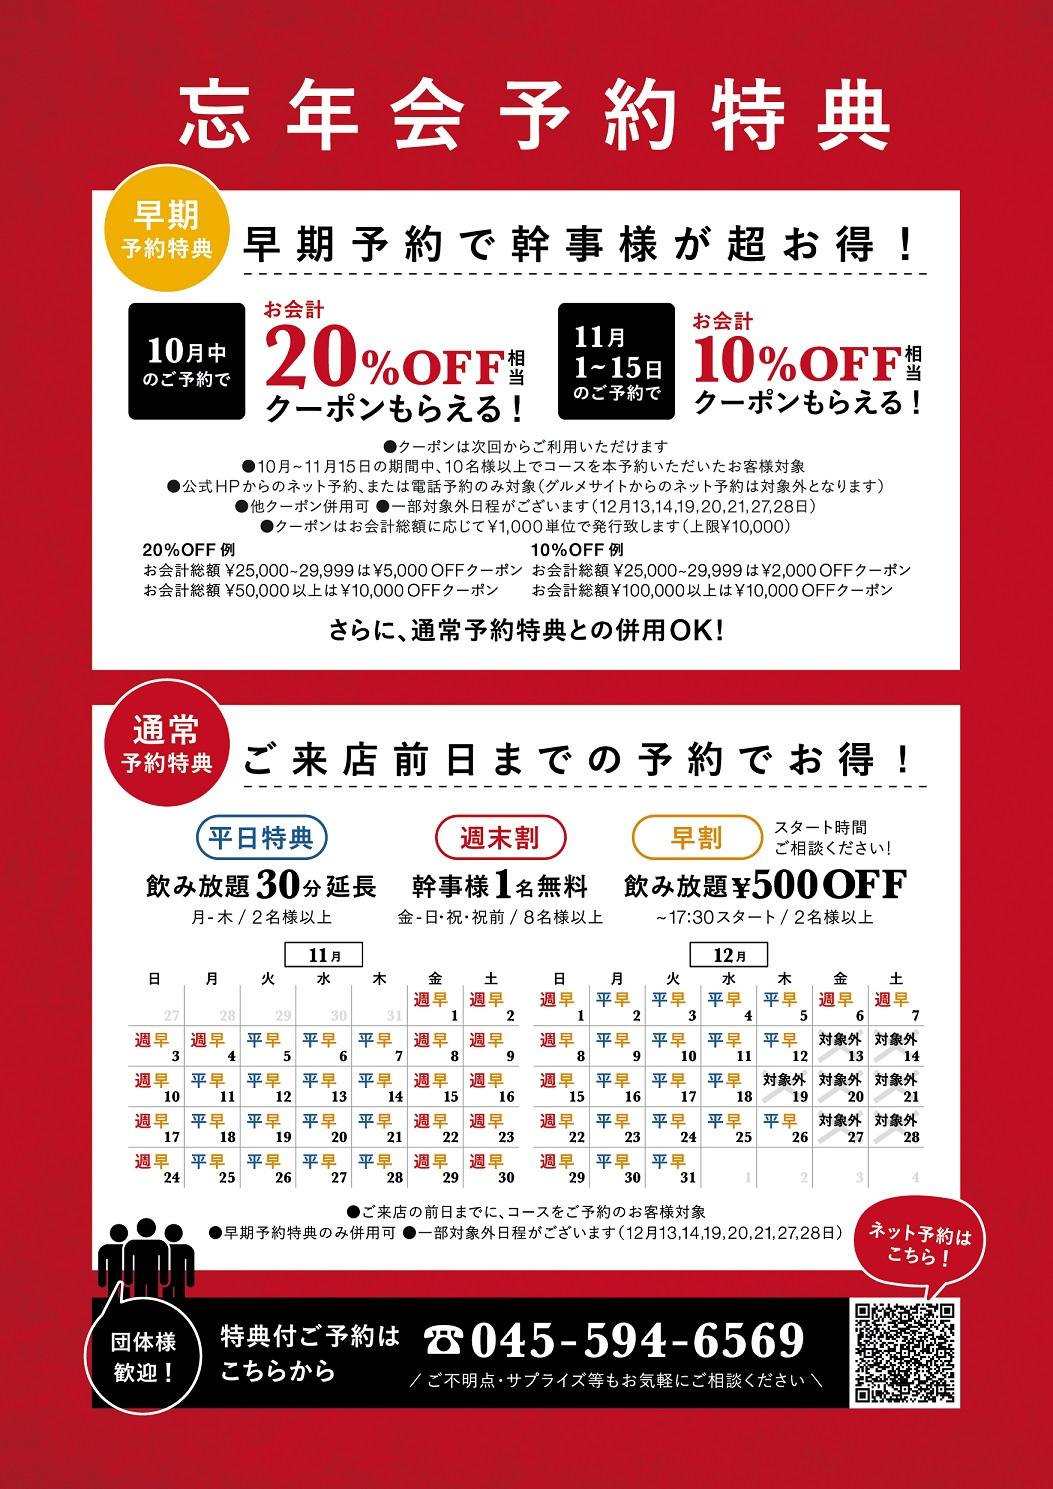 191003GB新横浜忘年会チラシ_特典